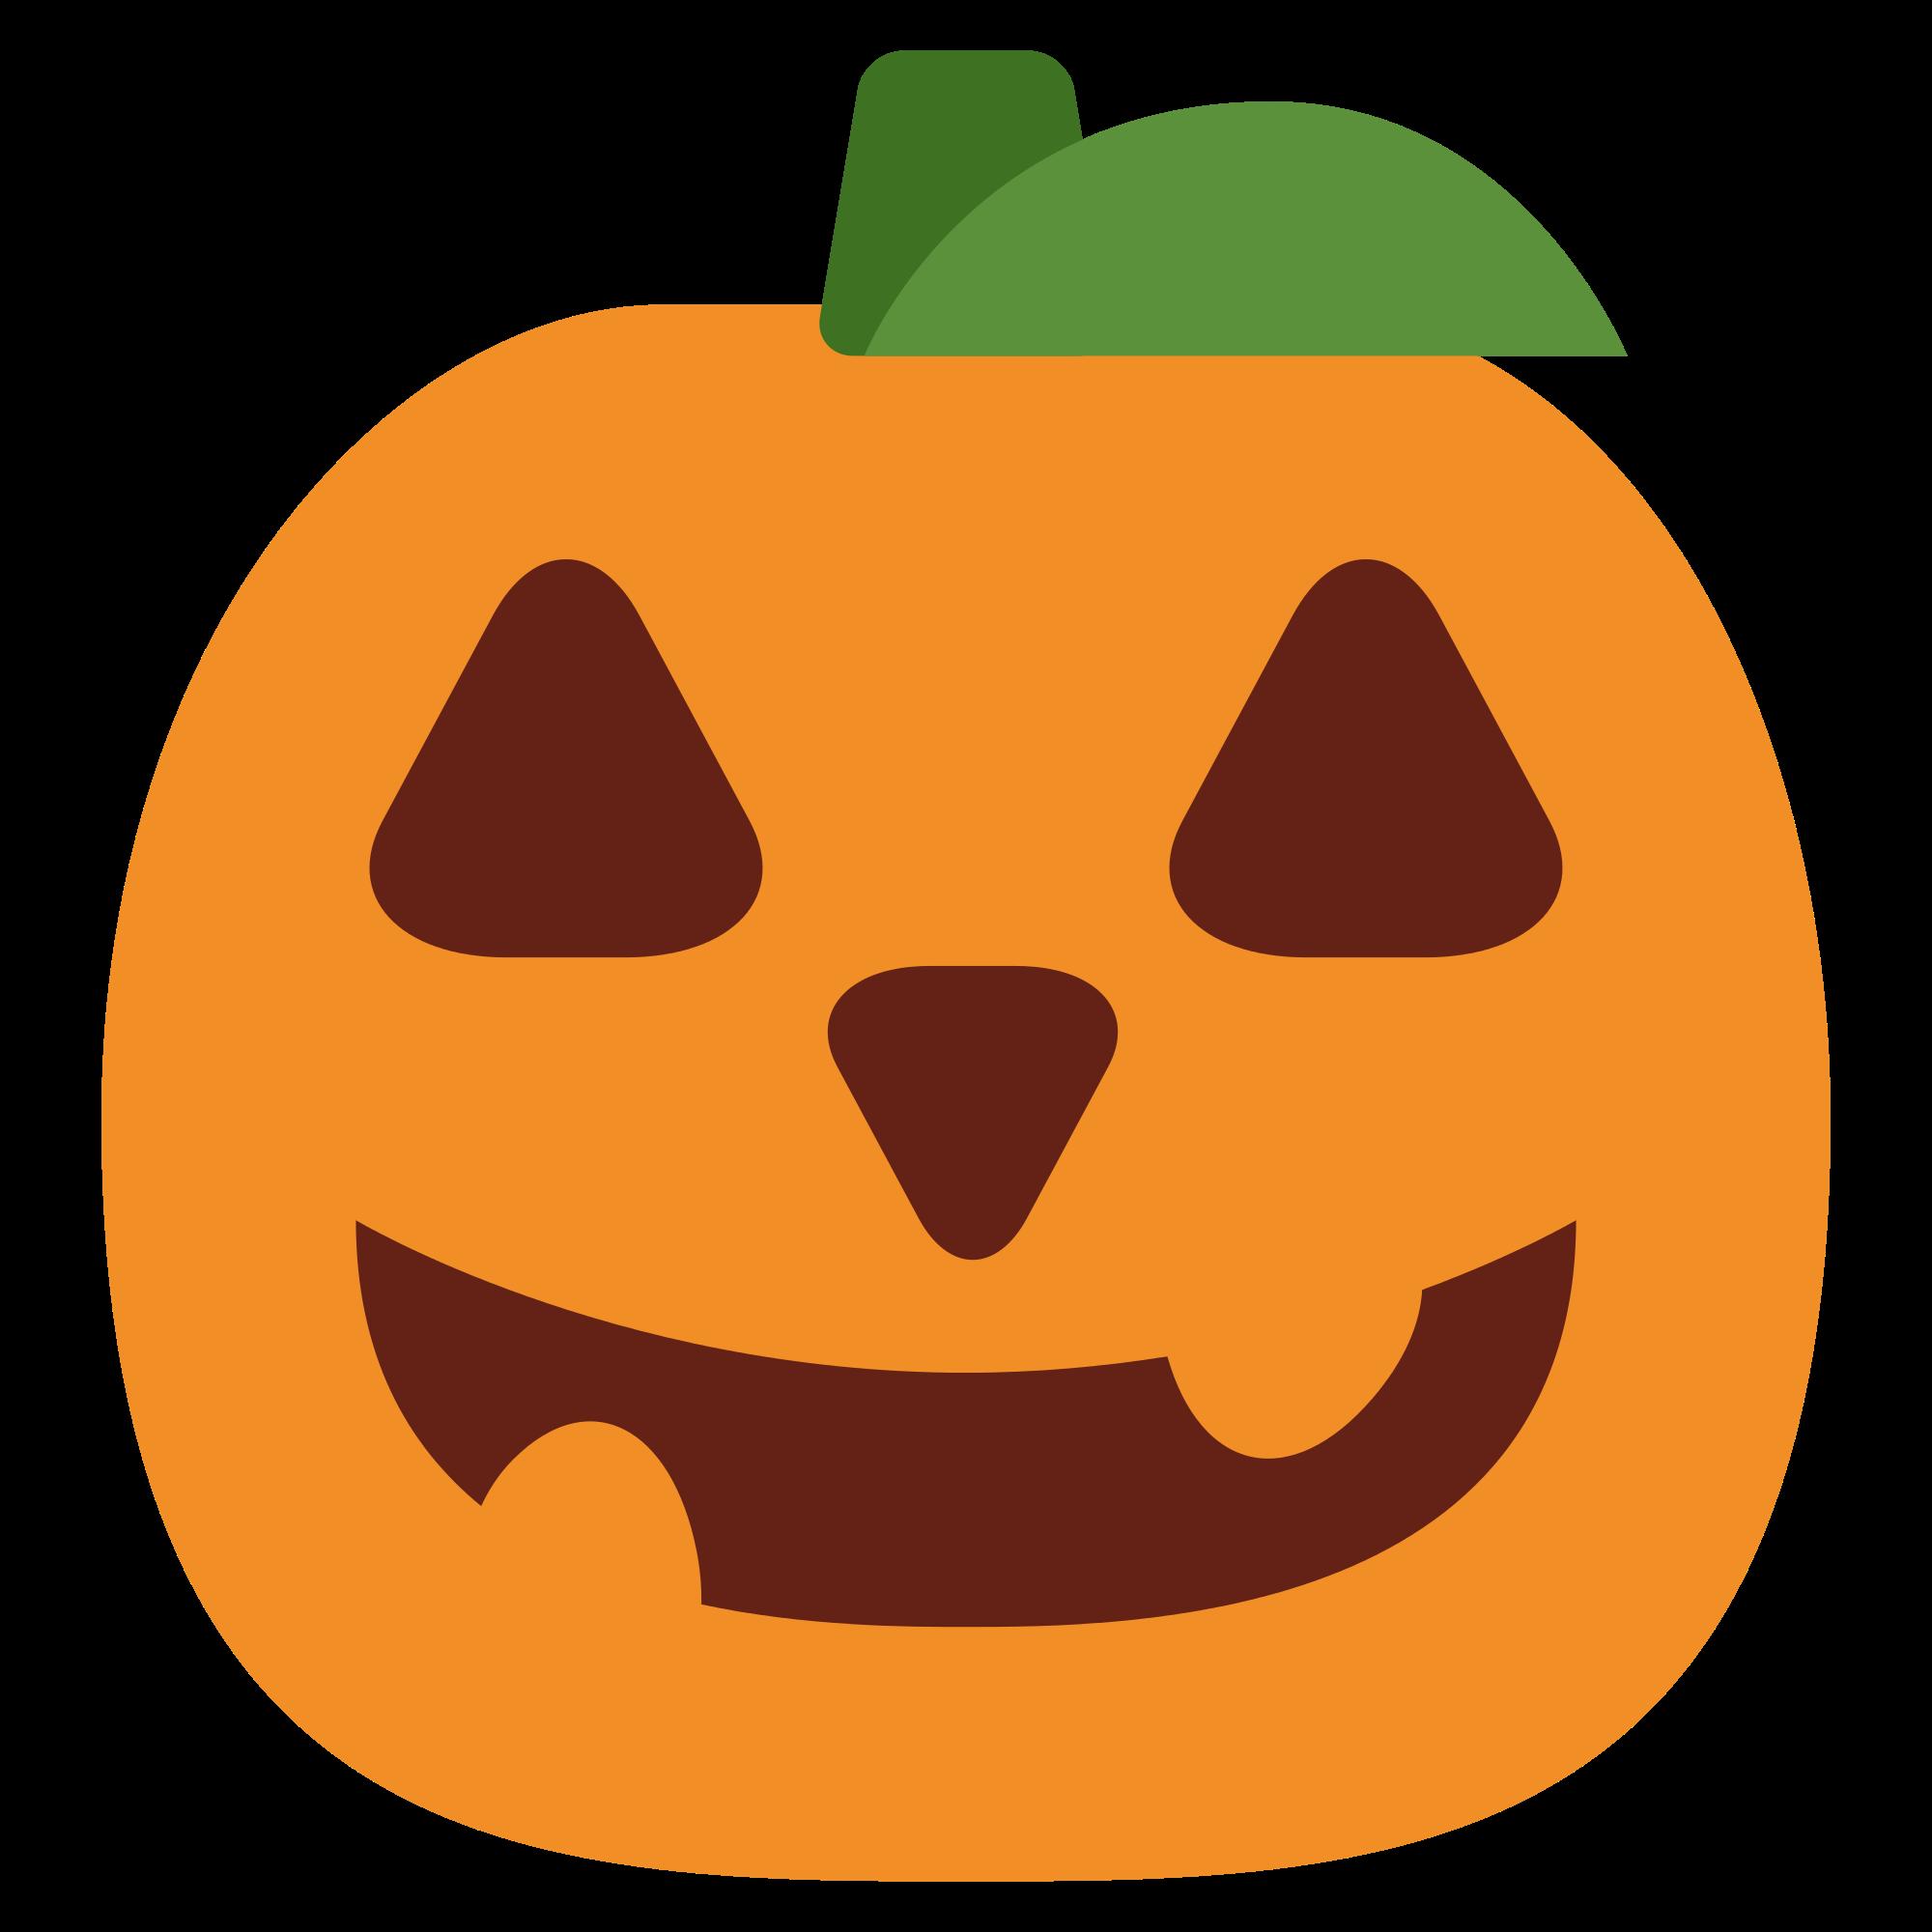 Pumpkin emoji clipart svg freeuse File:Twemoji 1f383.svg - Wikimedia Commons svg freeuse